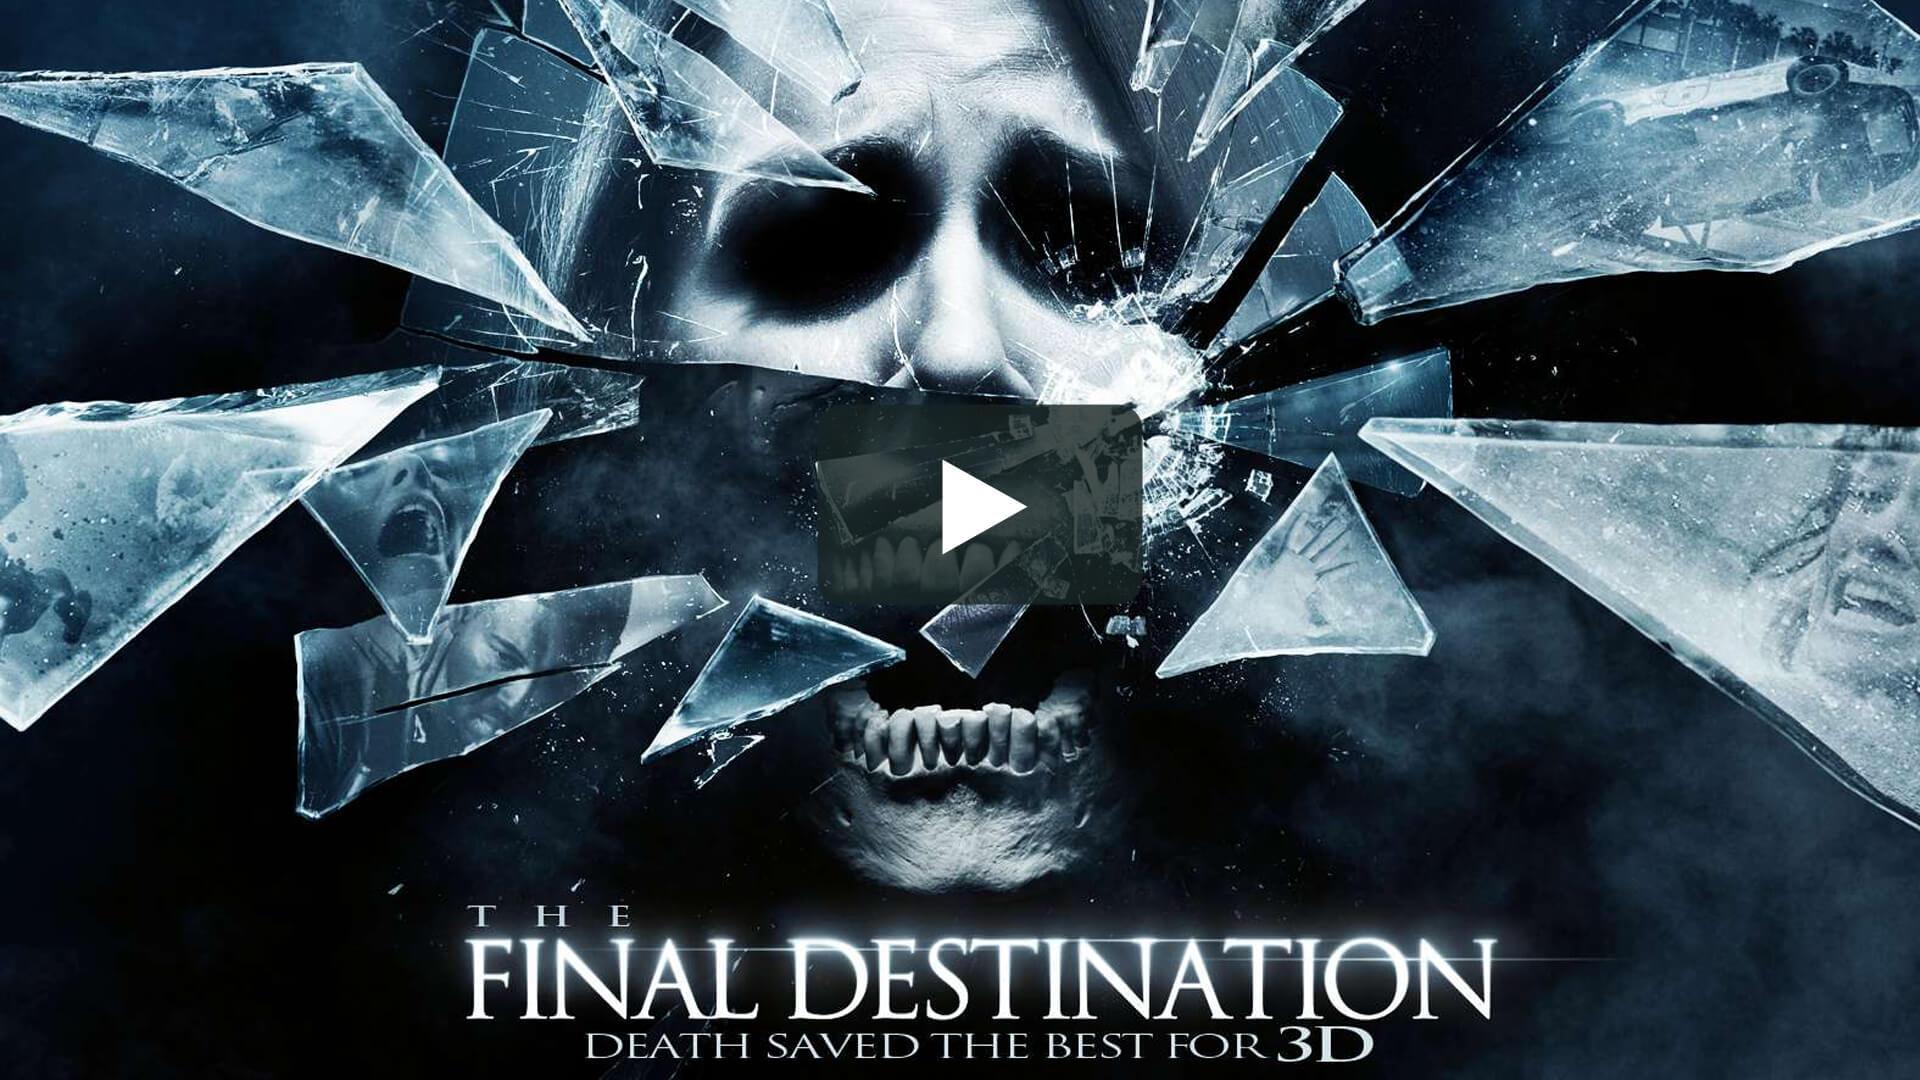 Final Destination 4 - 死神來了4